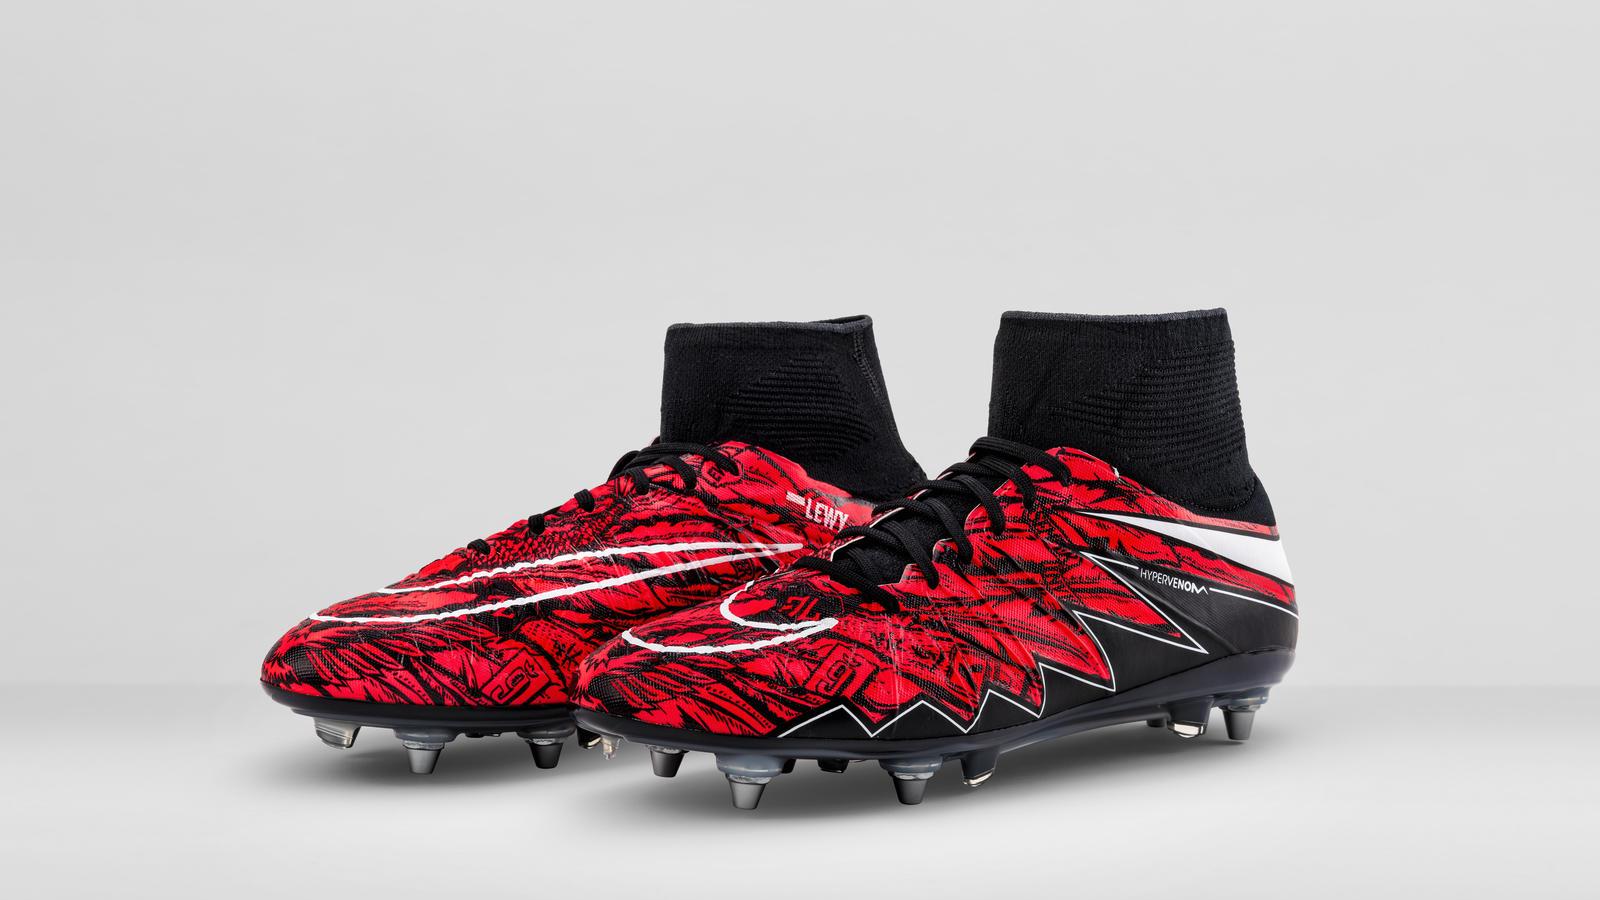 Nike Football Celebrates Robert Lewandowski with Exclusive Hypervenom II